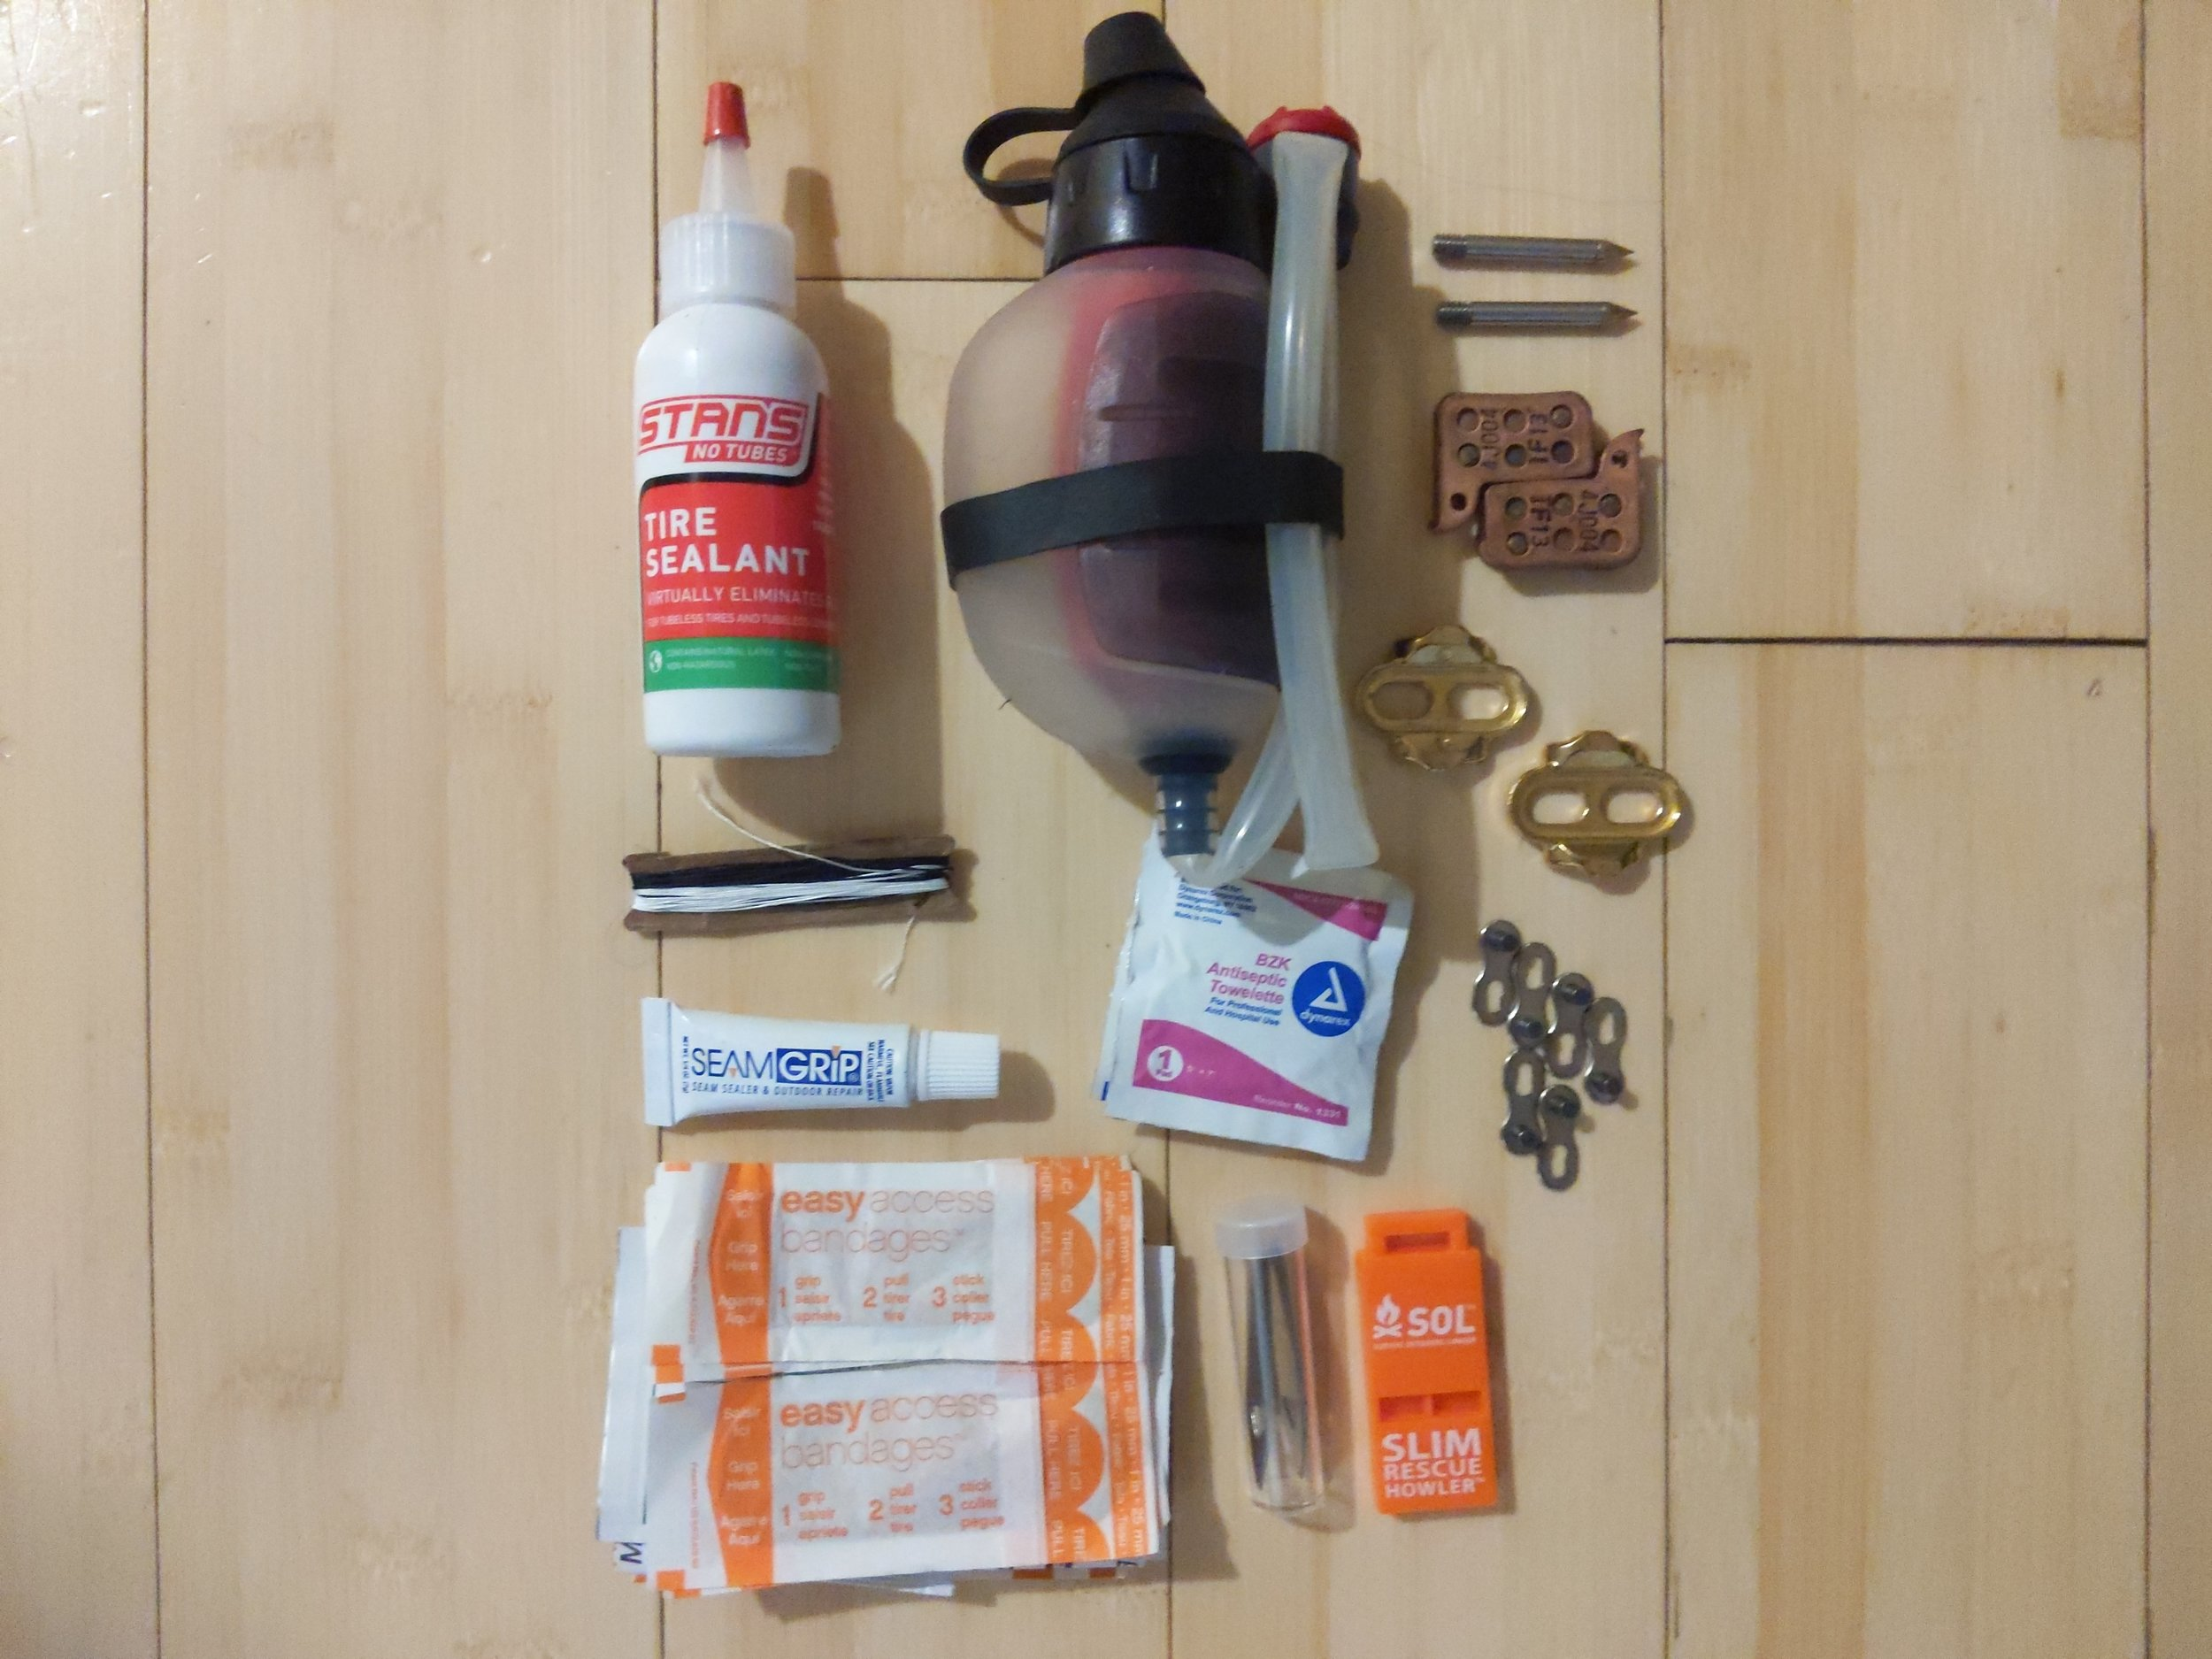 JPaks FramePak (bottom) - First Aid KitMSR Trailshot water filterSewing kitSpare brake pads, pedal cleats, and chain linksTire sealant